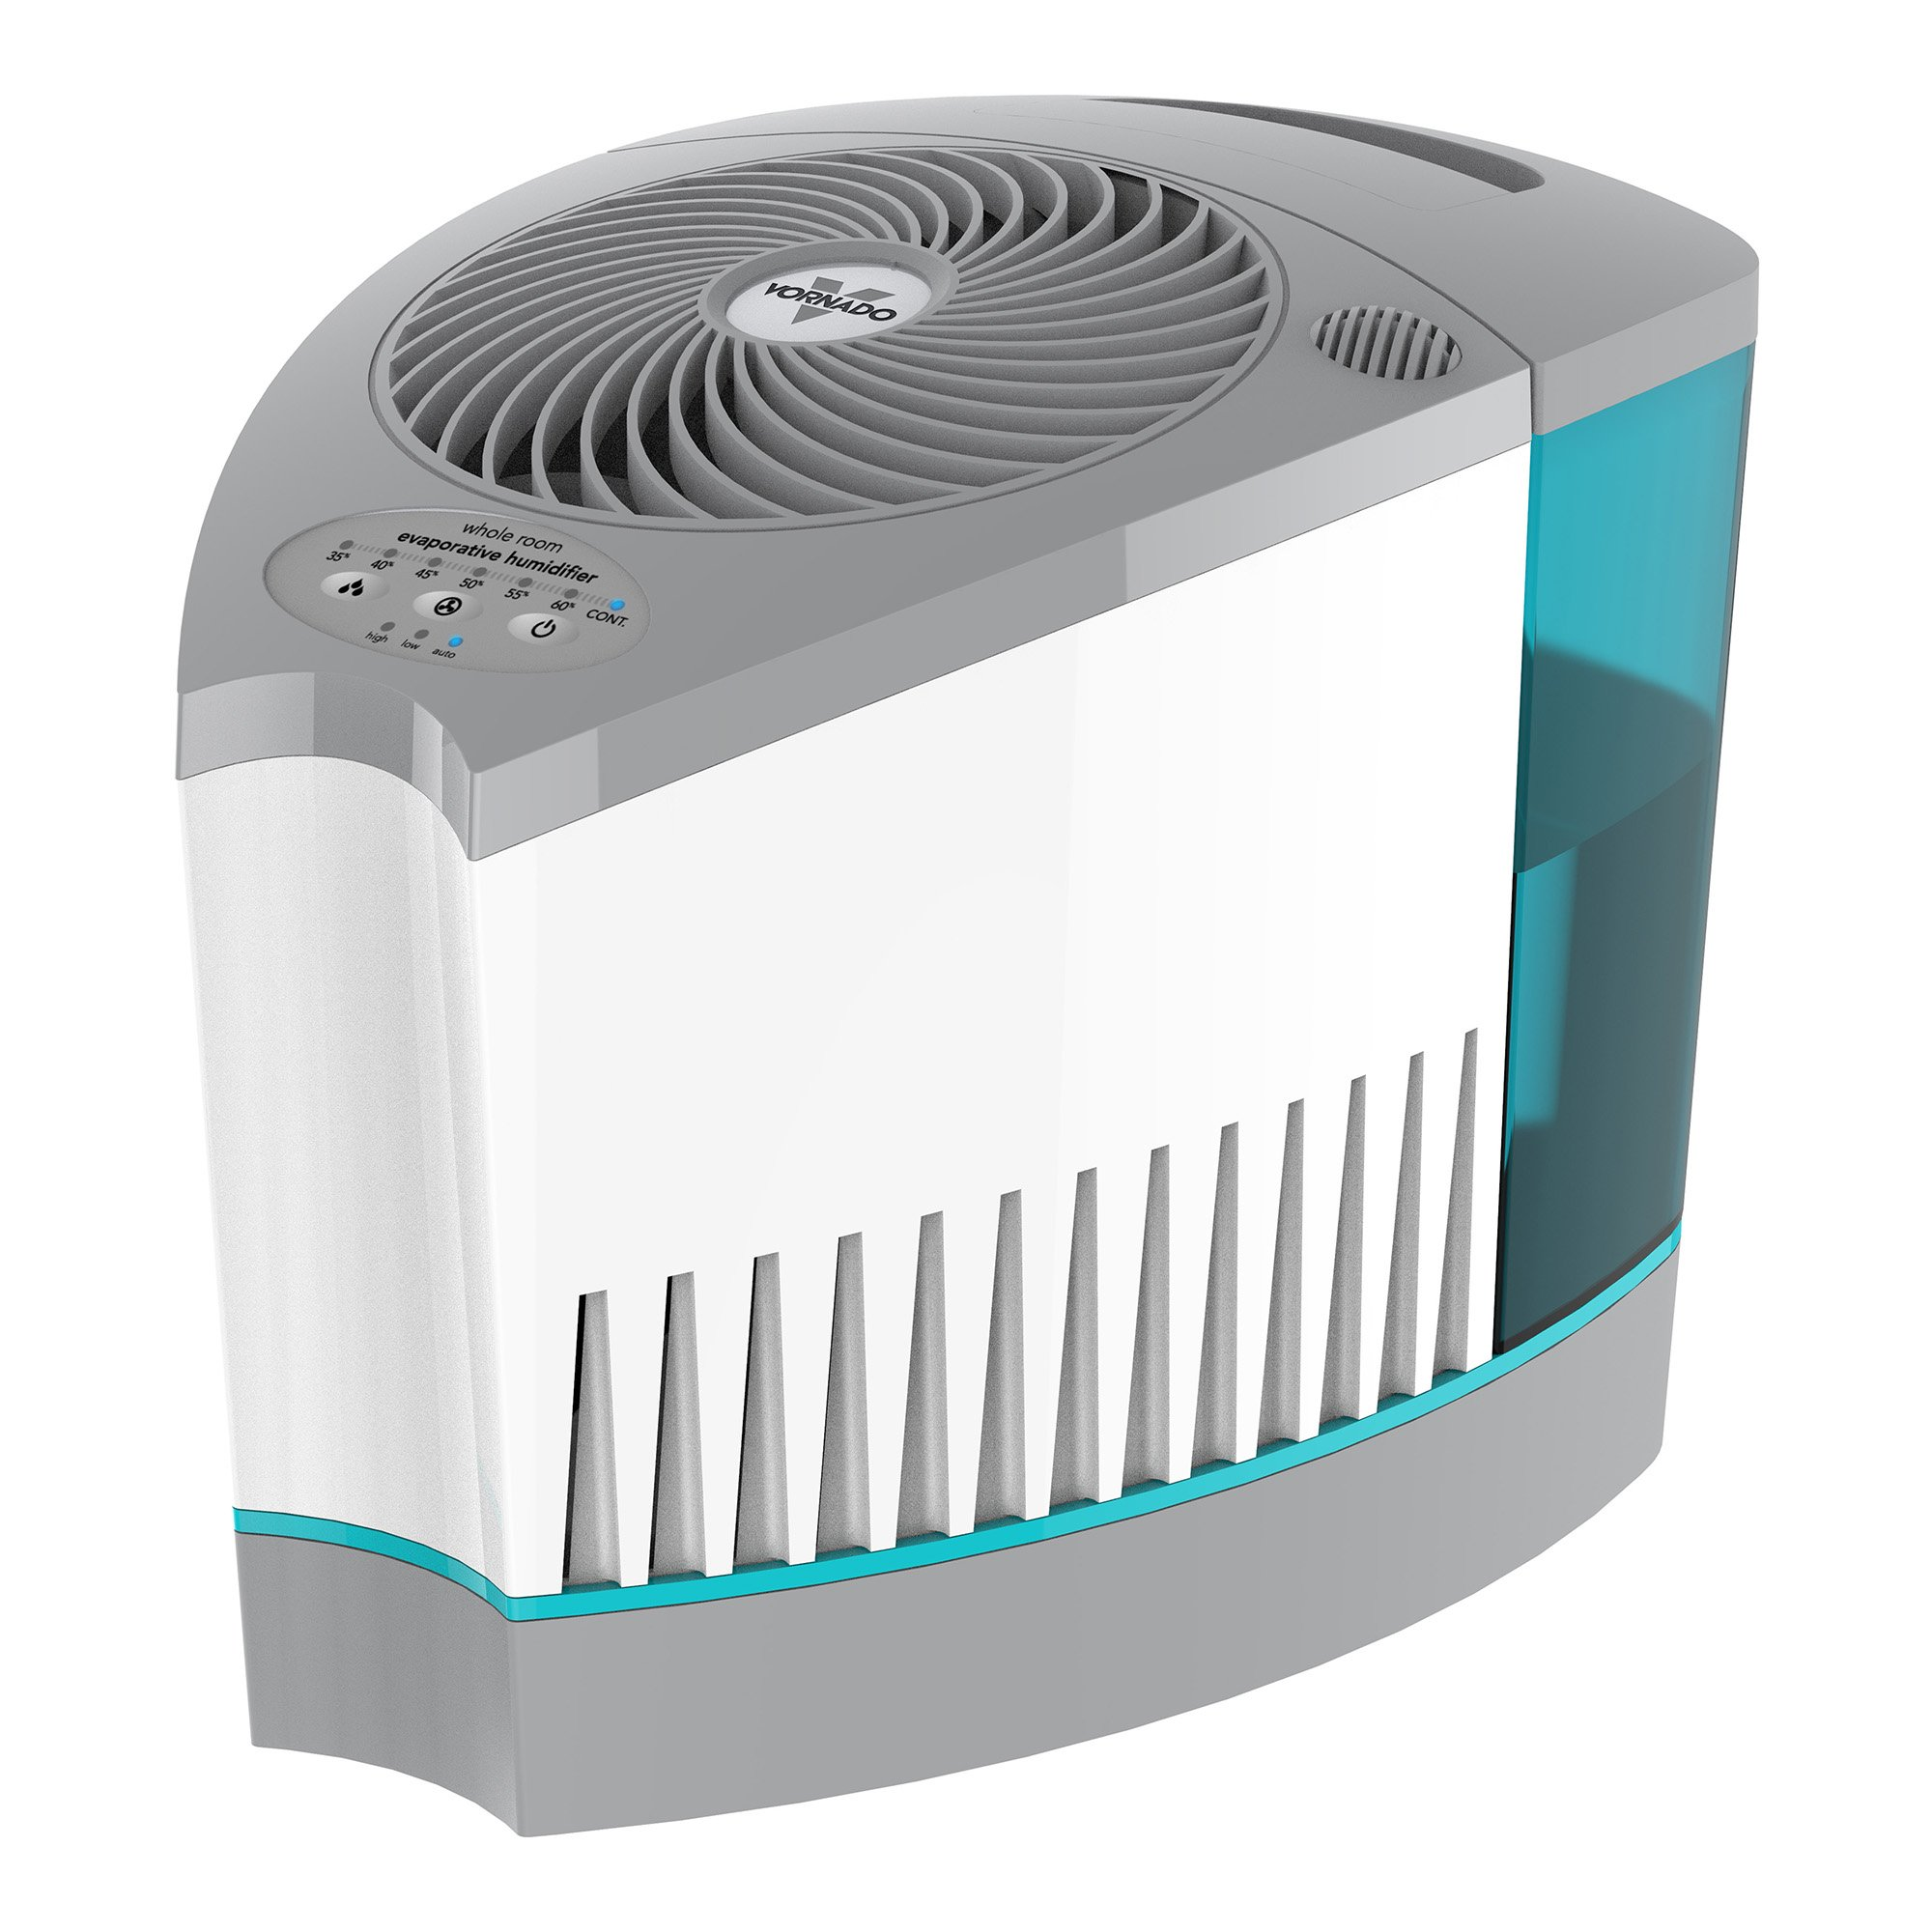 Vornado Evap3 1.5 Gallon 700 Sqaure Feet Evaporative Vortex Home Humidifier